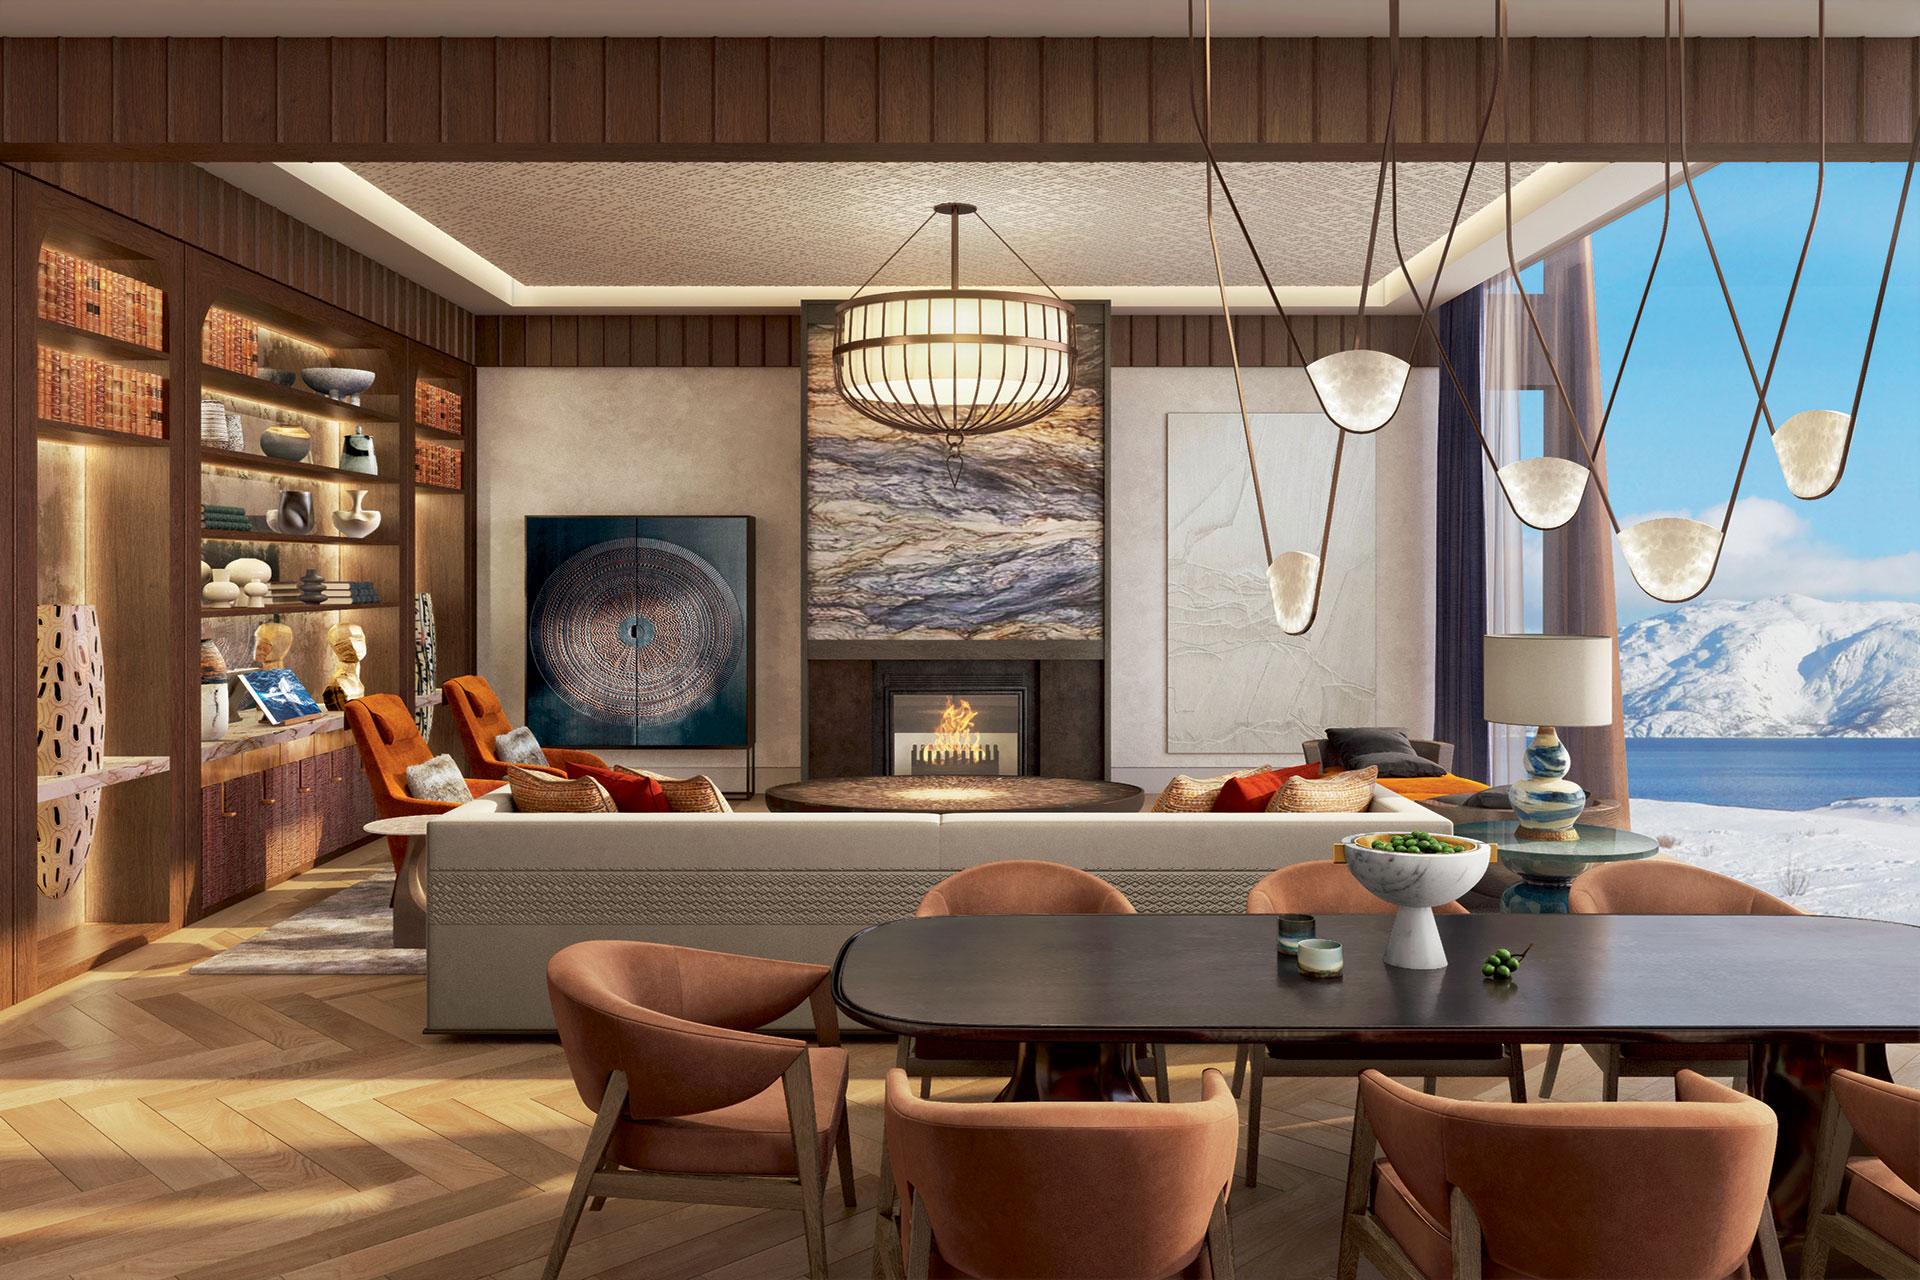 Interior Designers: The Top 10 Designers in London You Need to Know interior designers Interior Designers: The Top 10 Designers in London You Need to Know NOR HOTEL